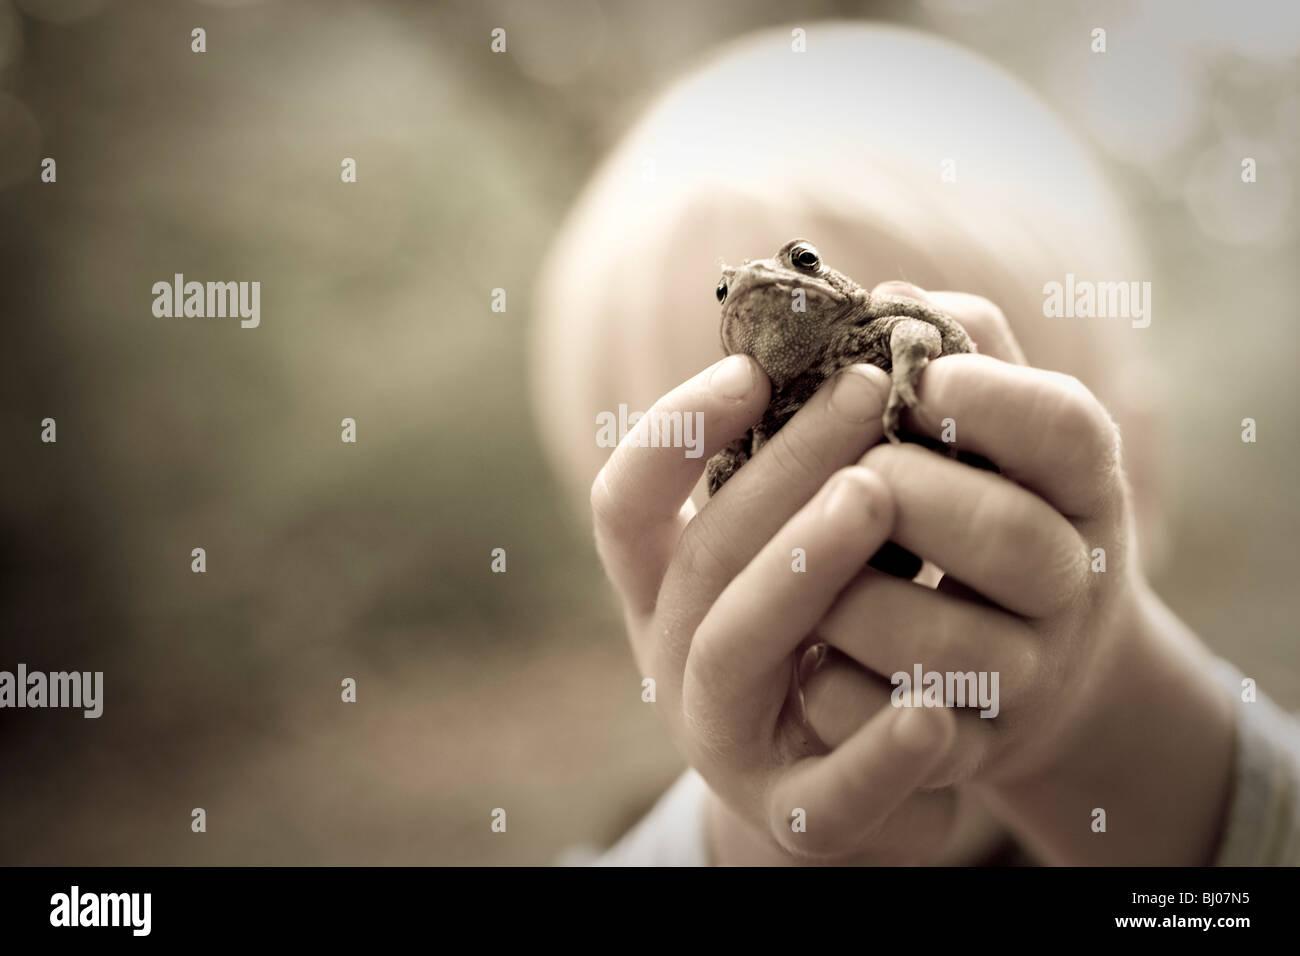 Niño sosteniendo un sapo. Imagen De Stock